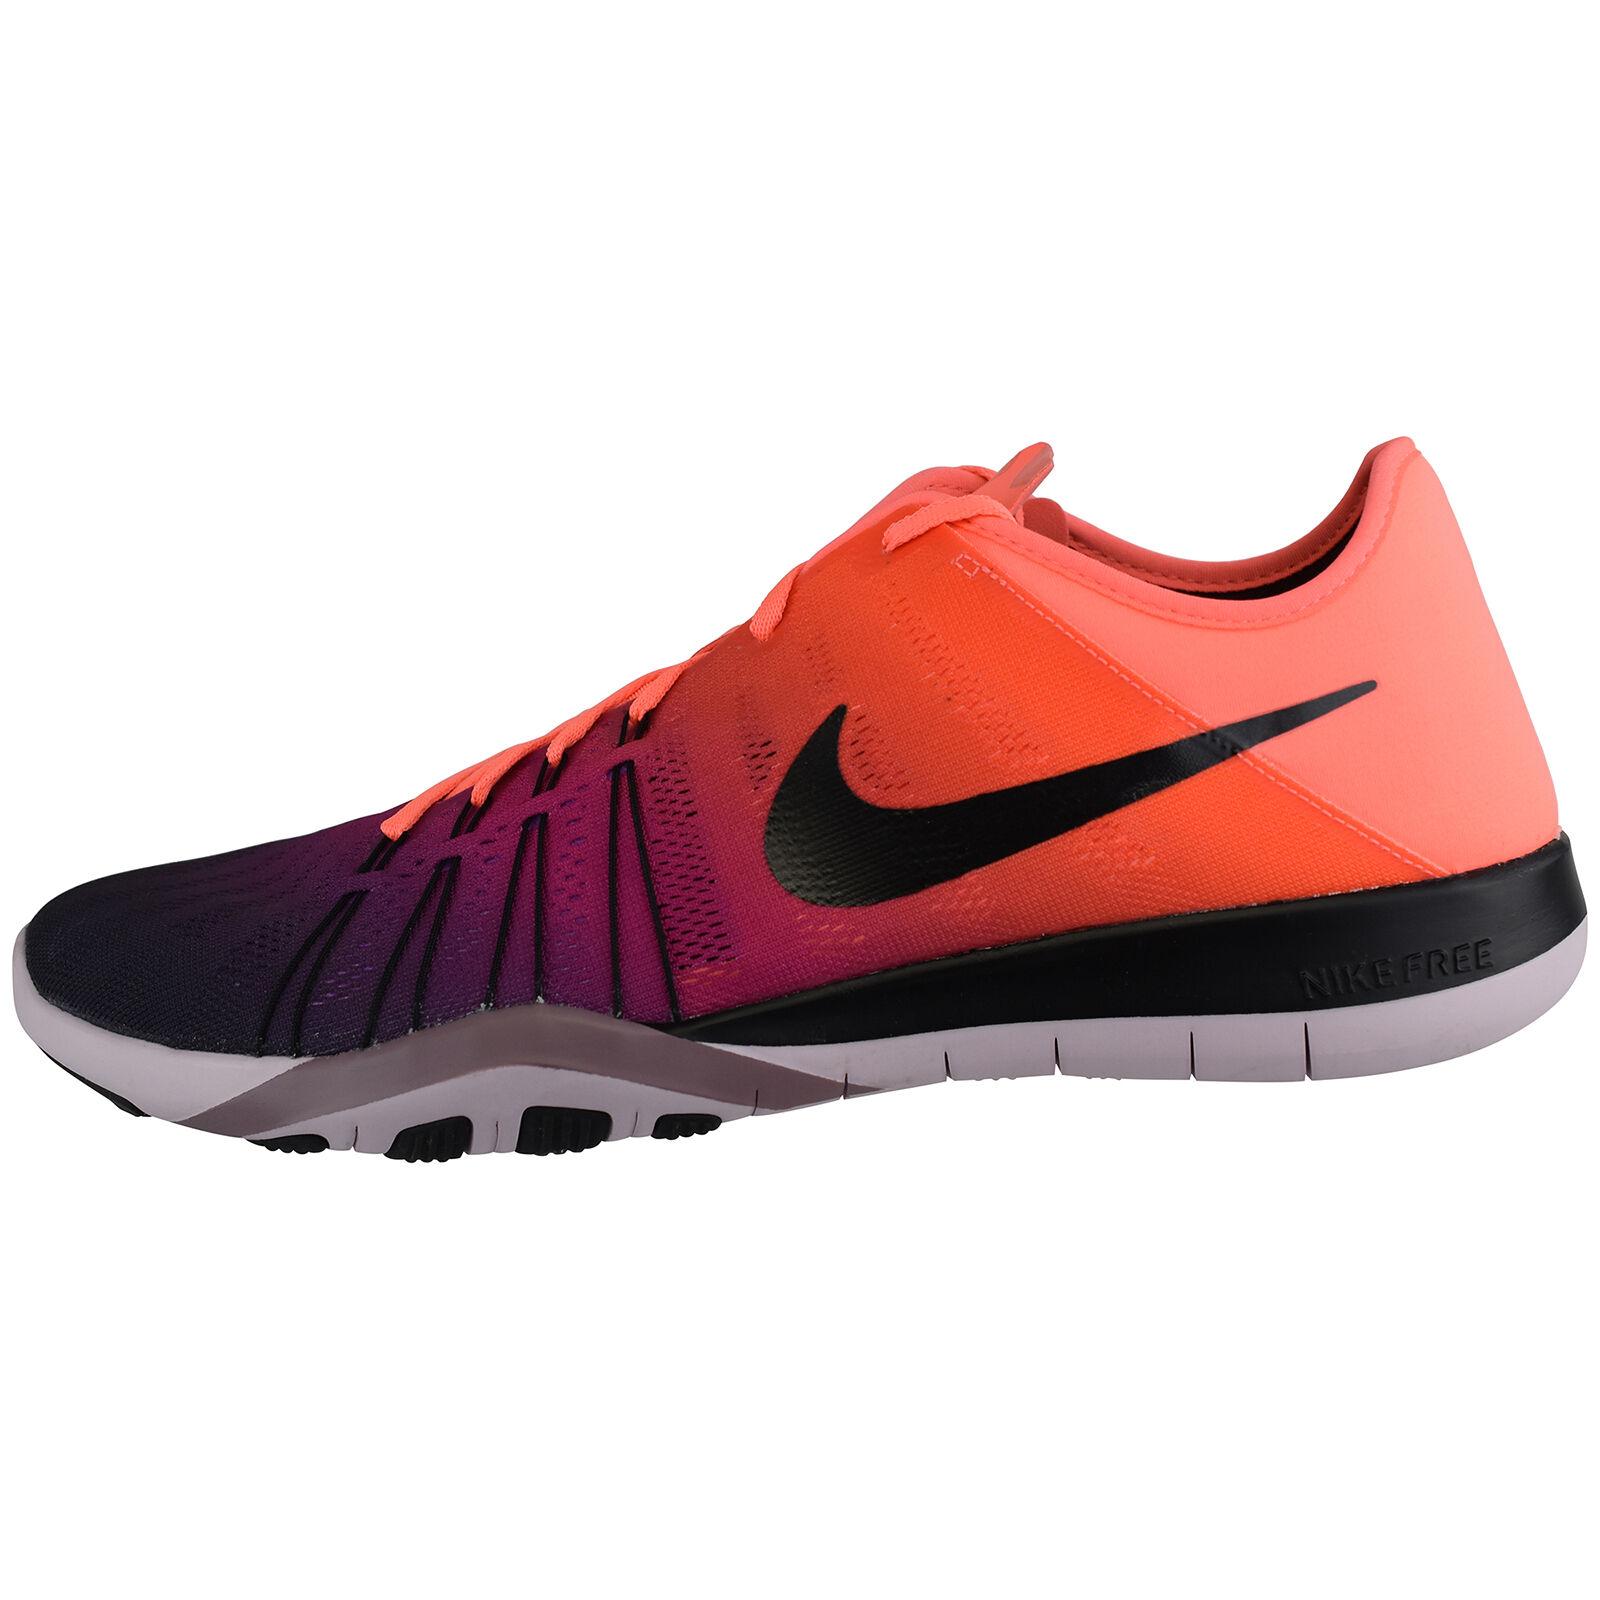 Wmns Nike Free tr. 6 spctrm 849804-800 LIFESTYLE scarpe da corsa run The most popular shoes for men and women